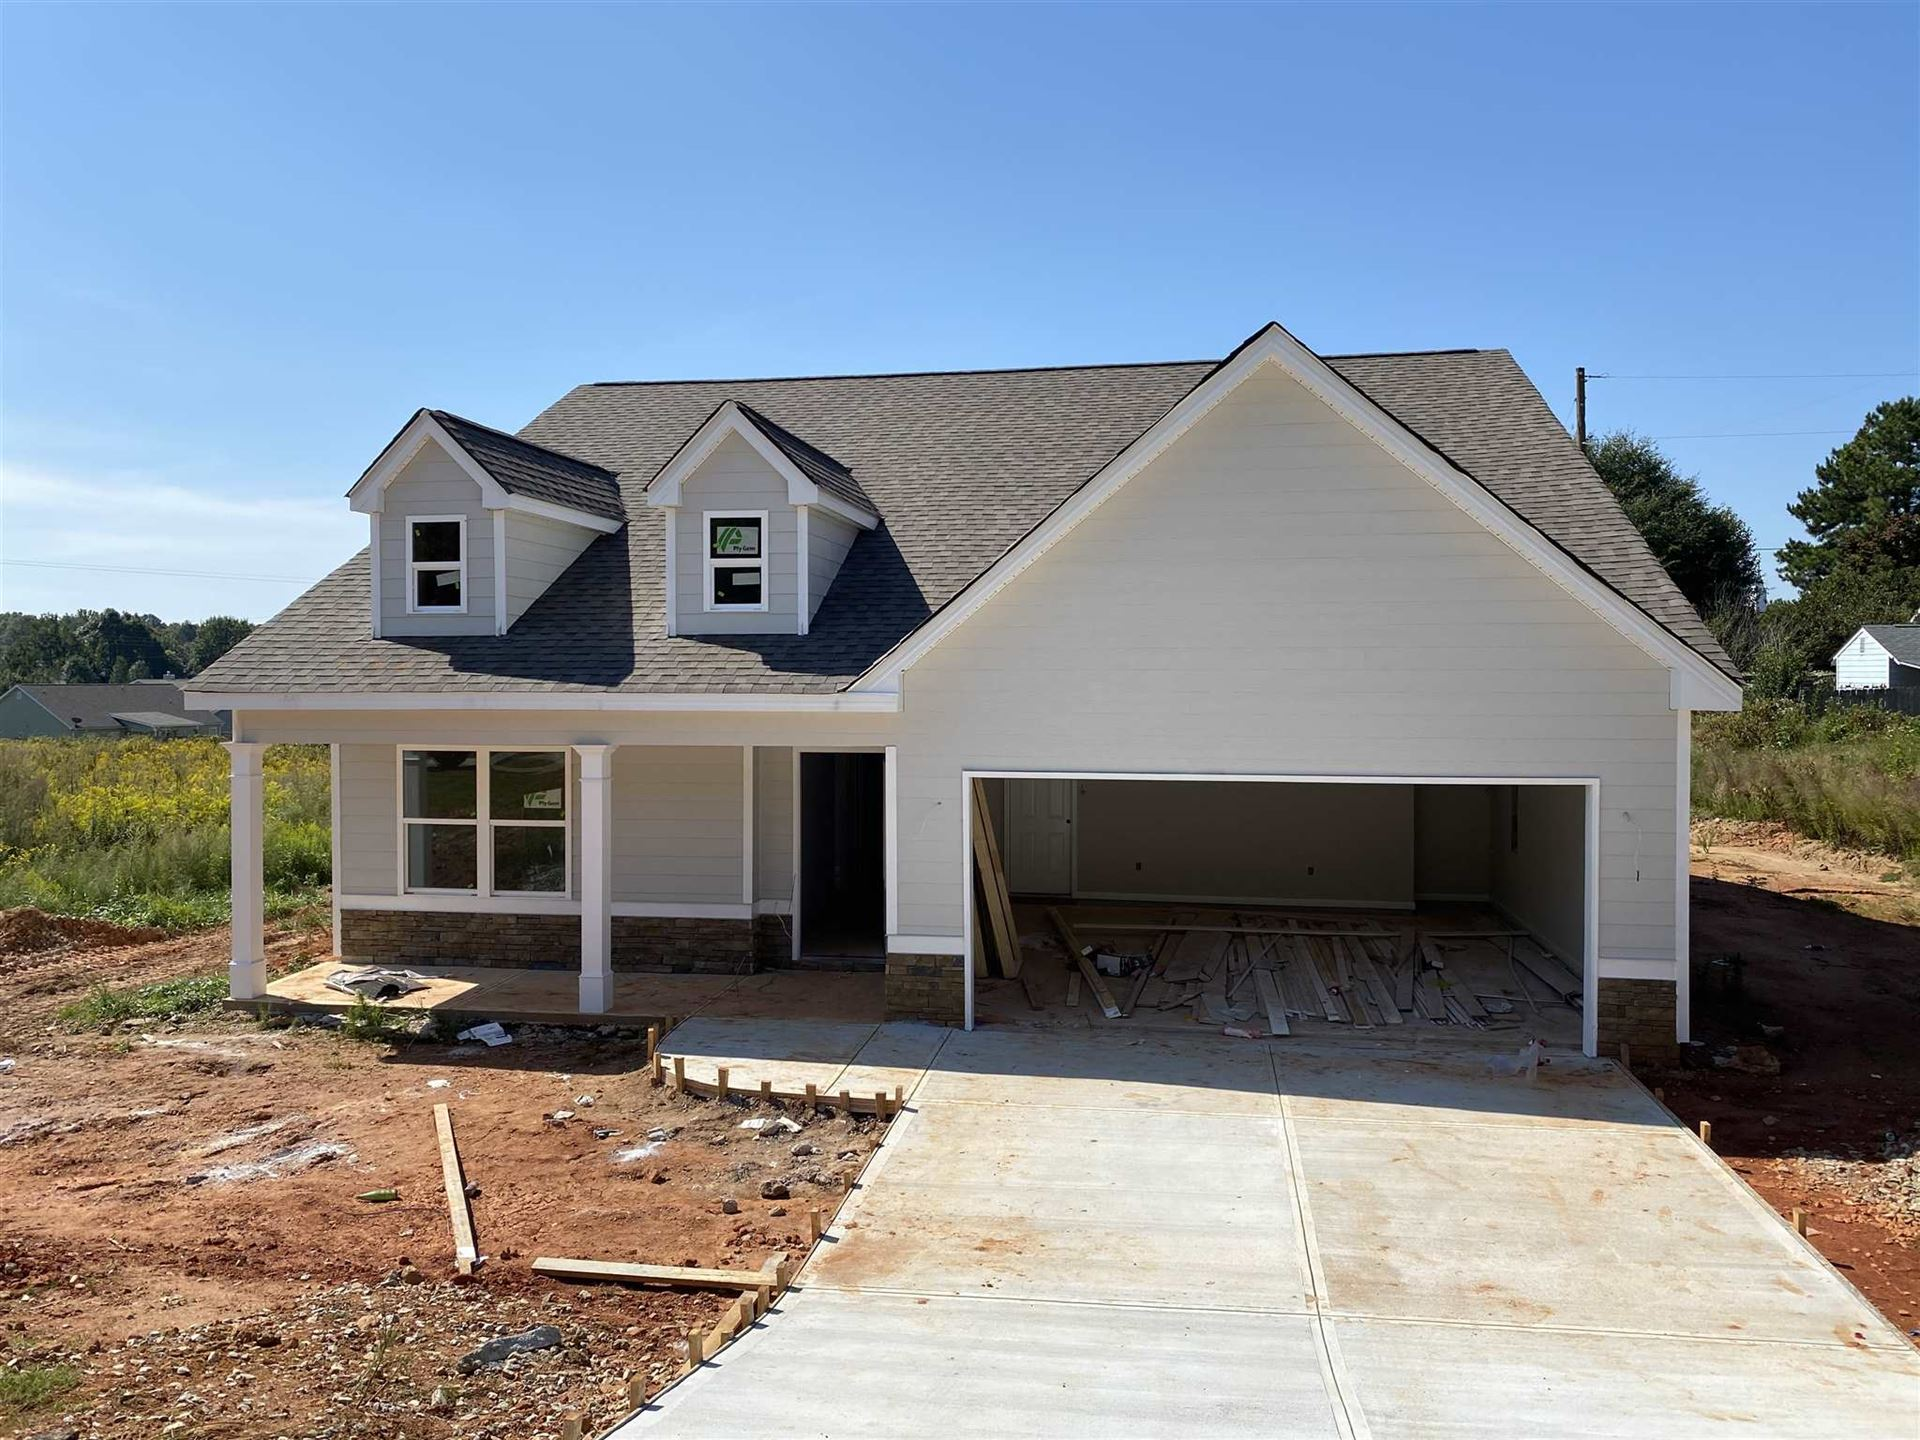 1761 Oak Spring St, Statham, GA 30666 - MLS#: 8853333